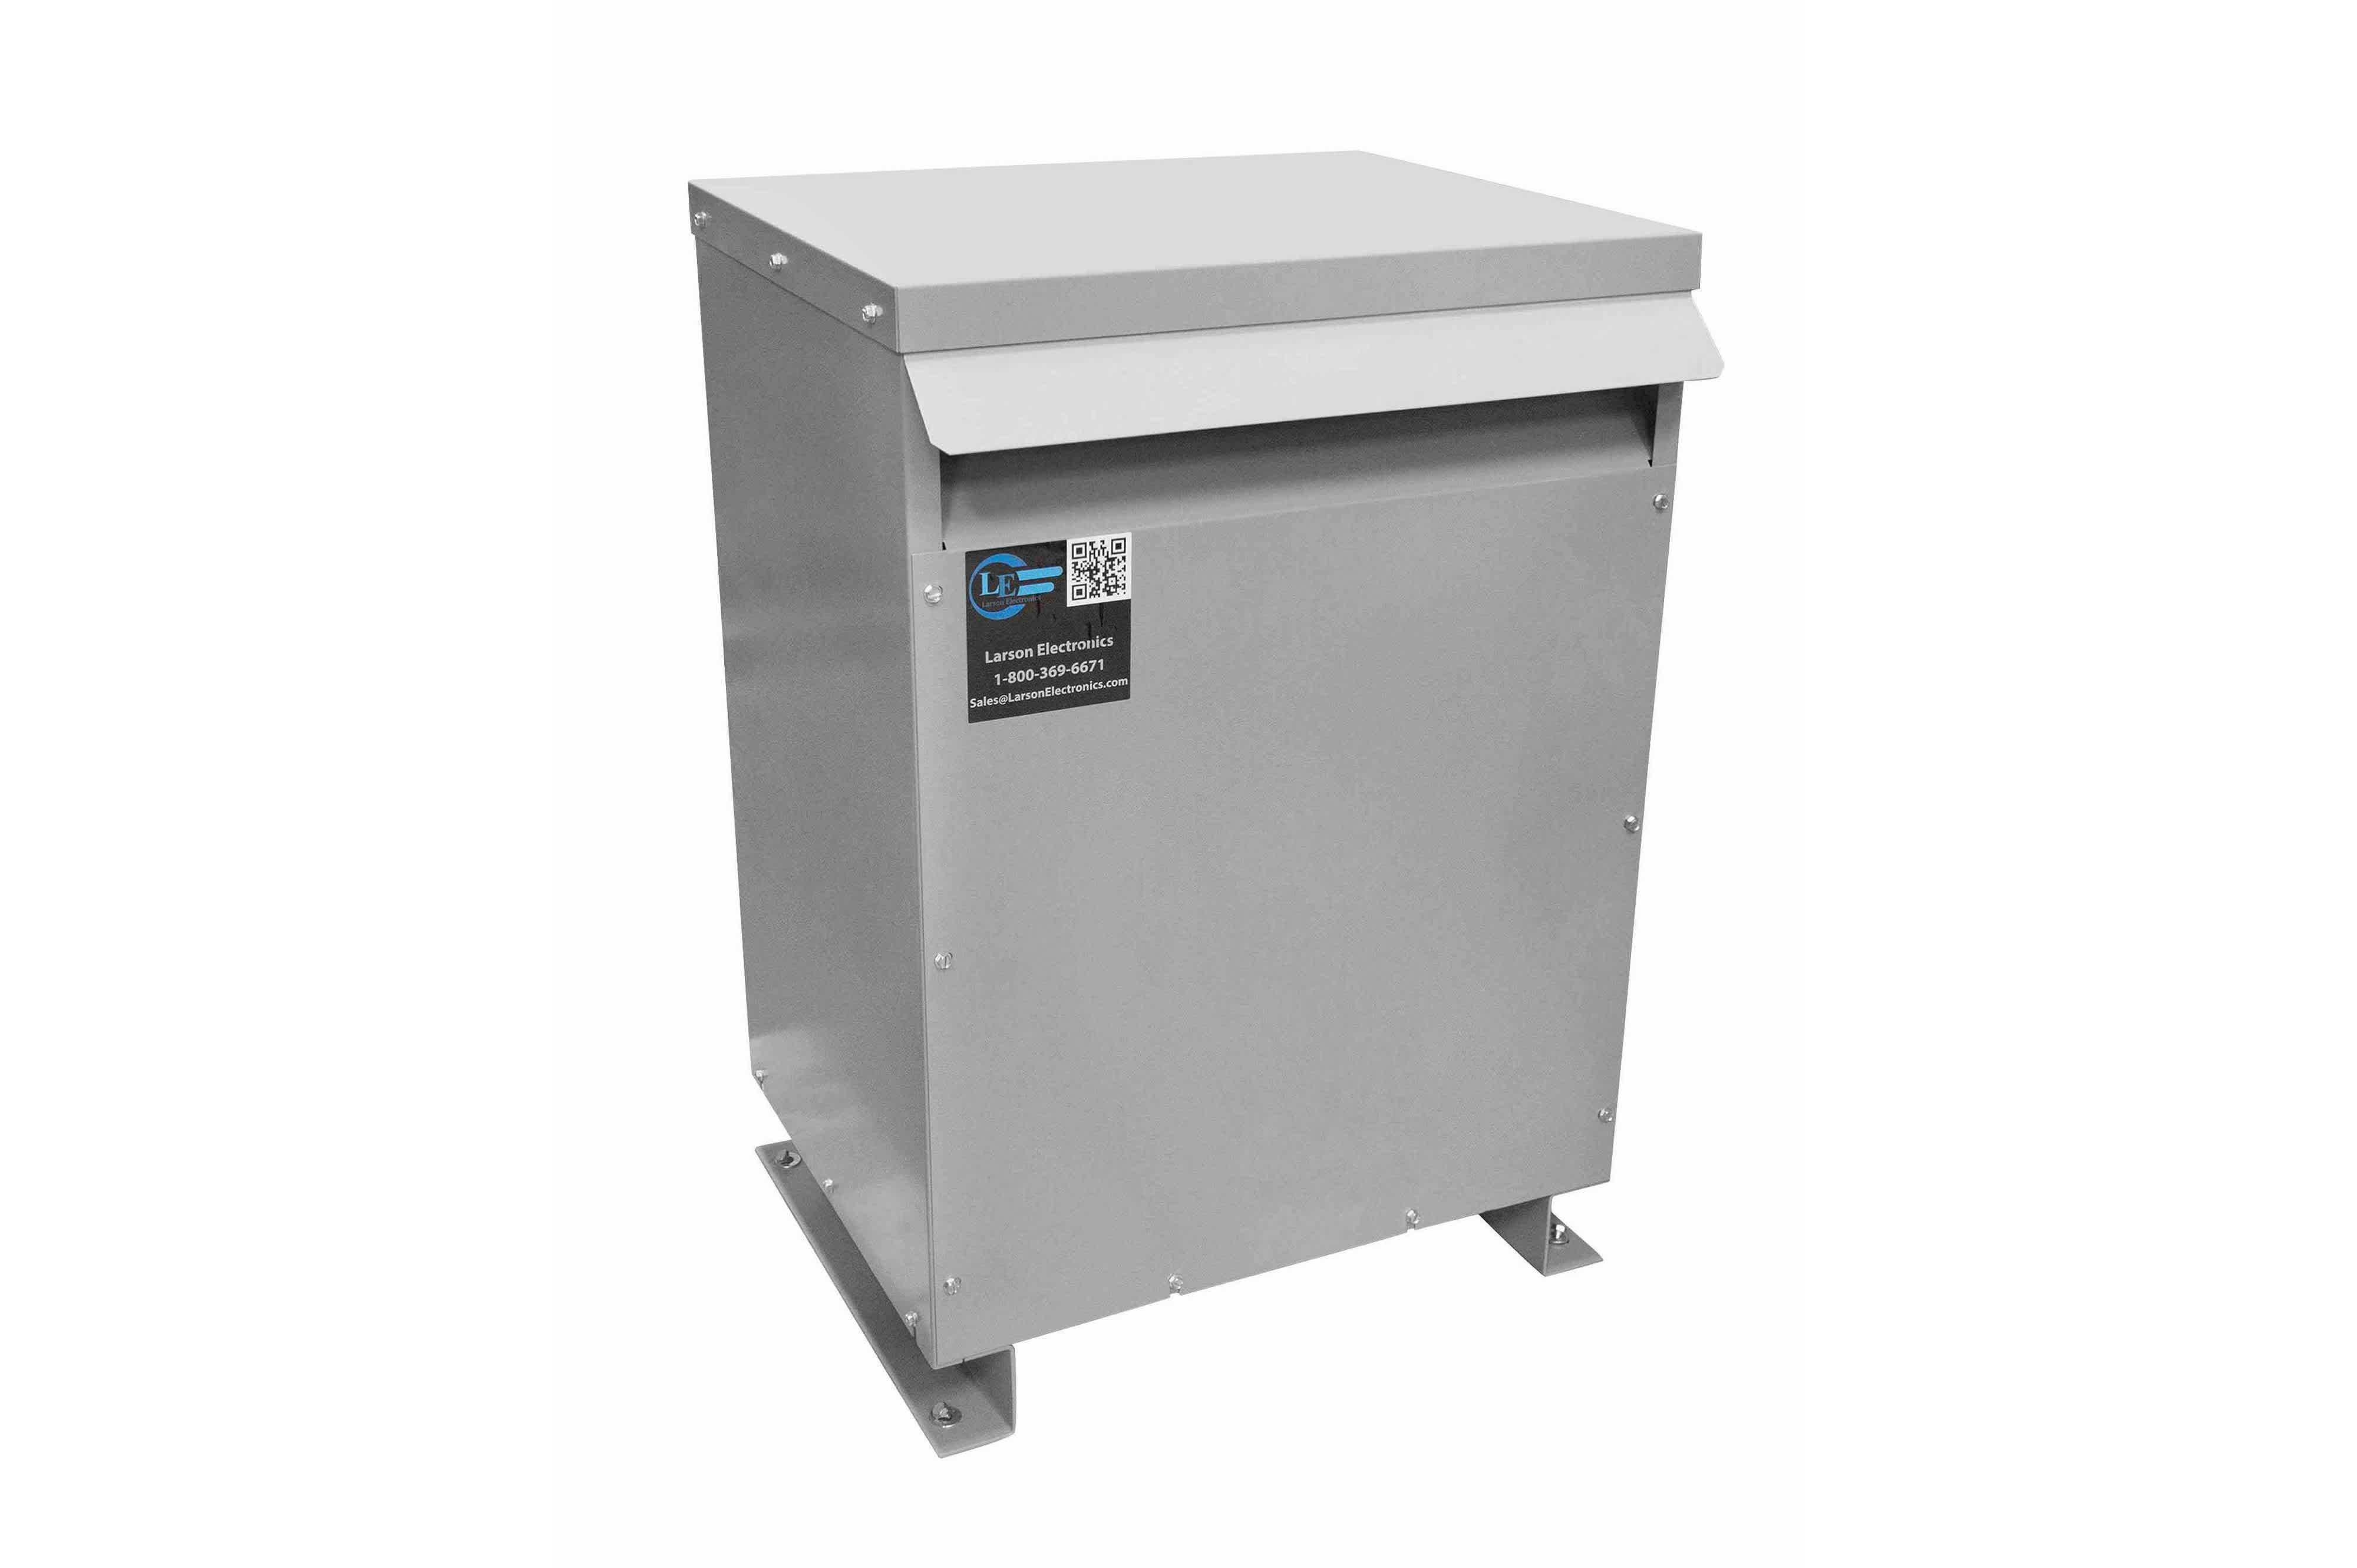 400 kVA 3PH Isolation Transformer, 460V Wye Primary, 600V Delta Secondary, N3R, Ventilated, 60 Hz